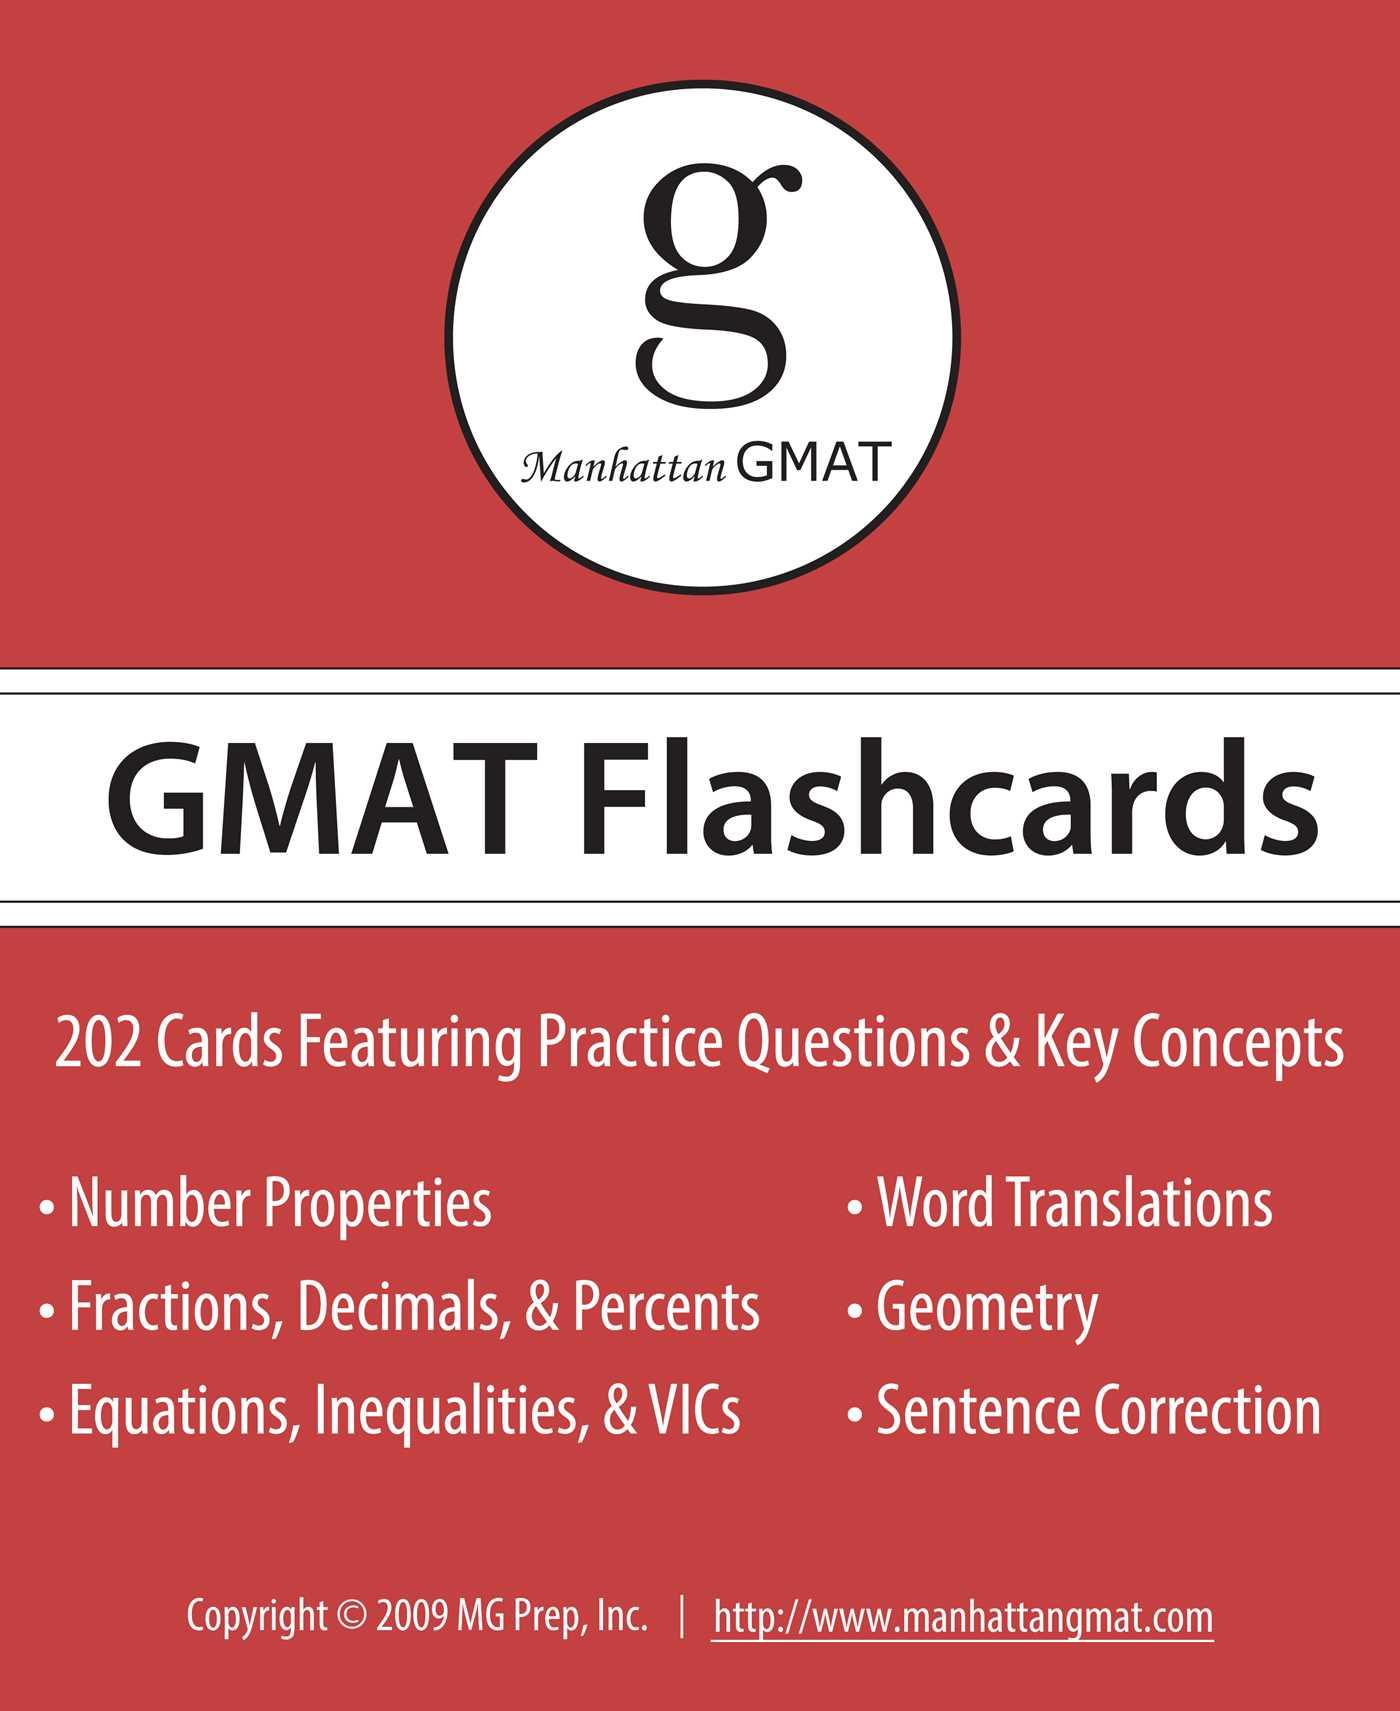 Gmat flashcard